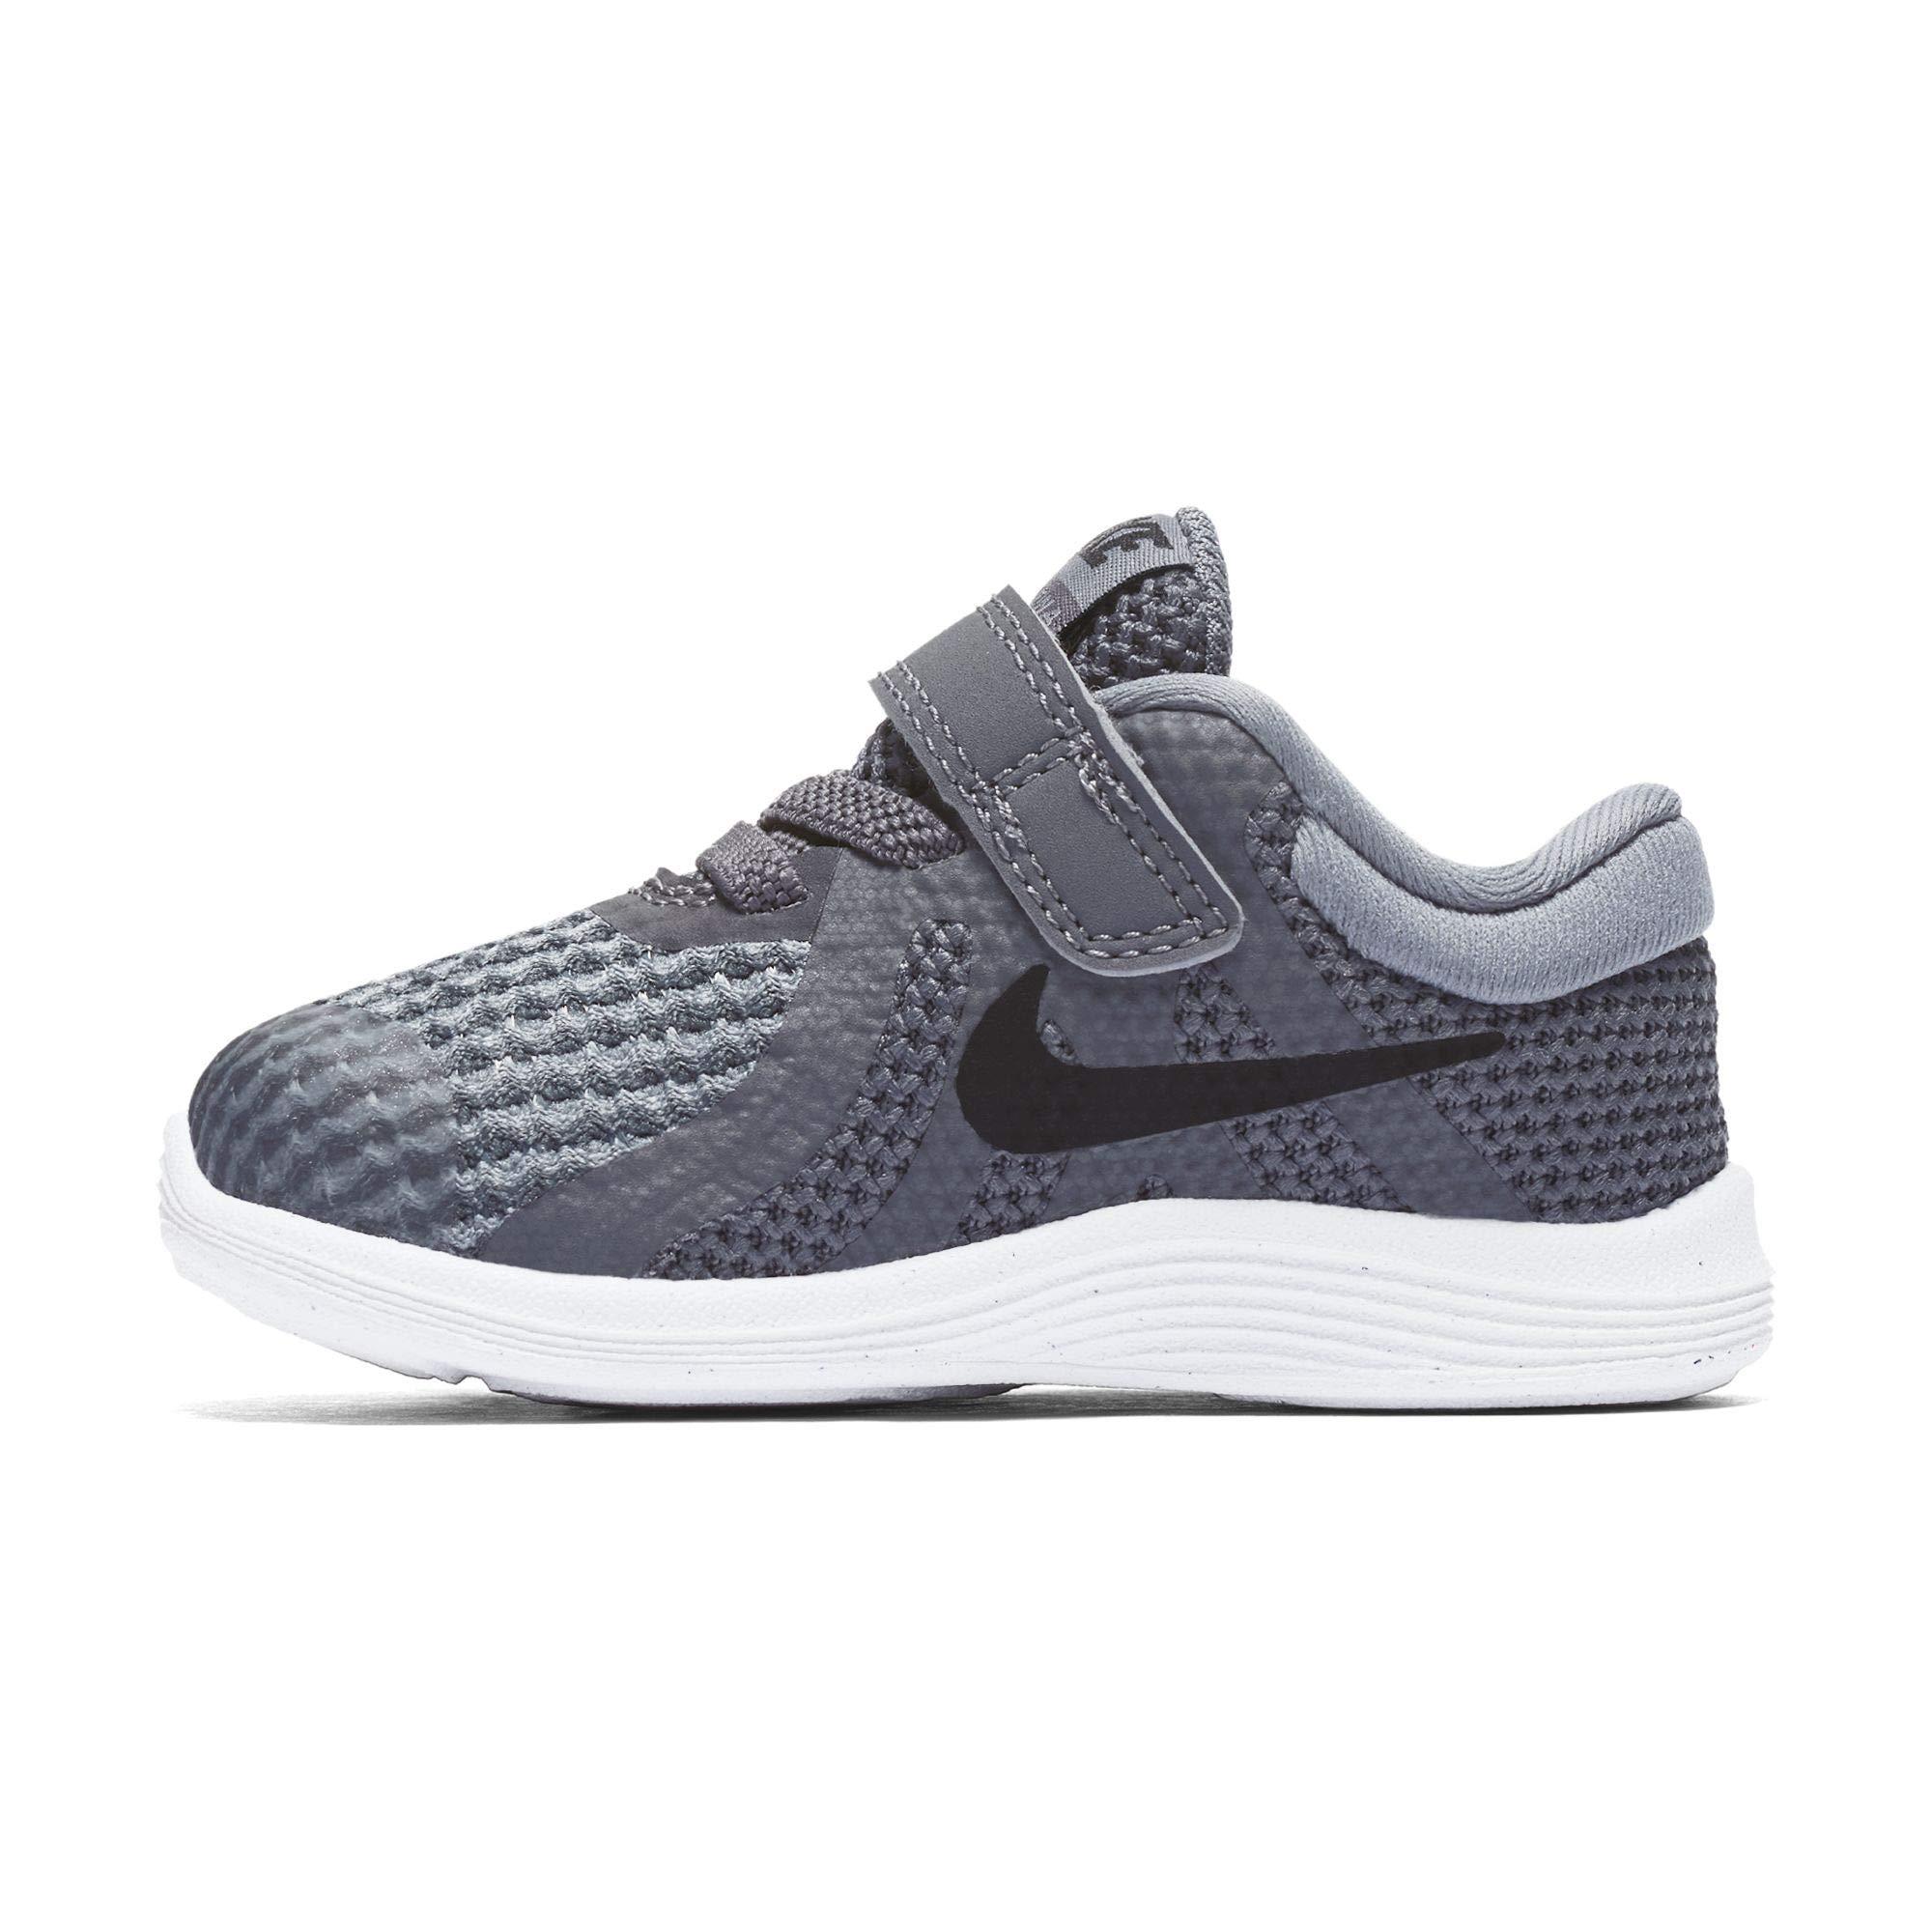 Nike Boys' Revolution 4 (TDV) Running Shoe, Dark Black-Cool Grey-White, 7C Regular US Toddler